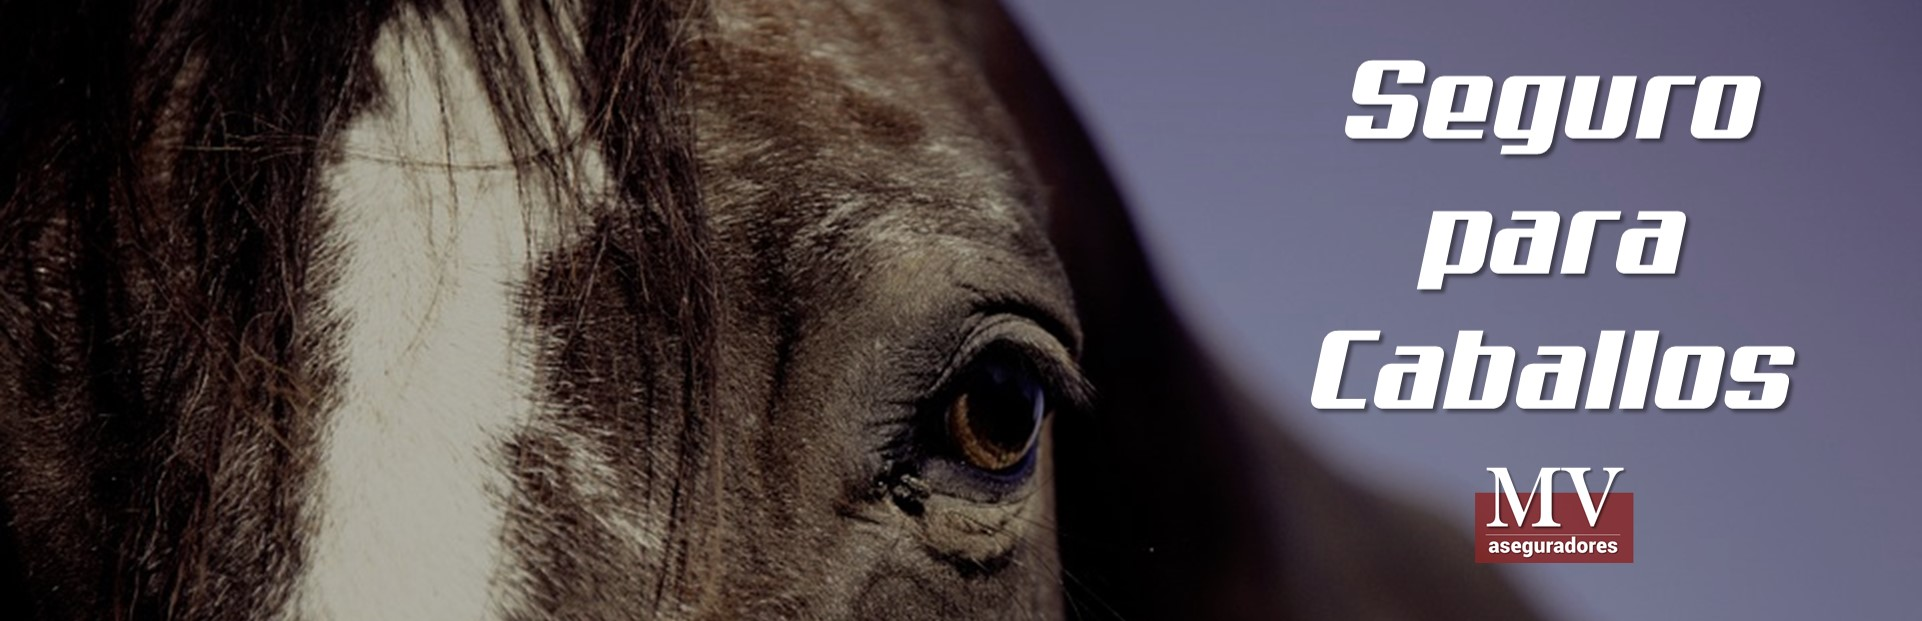 slider 6 seguro para caballos